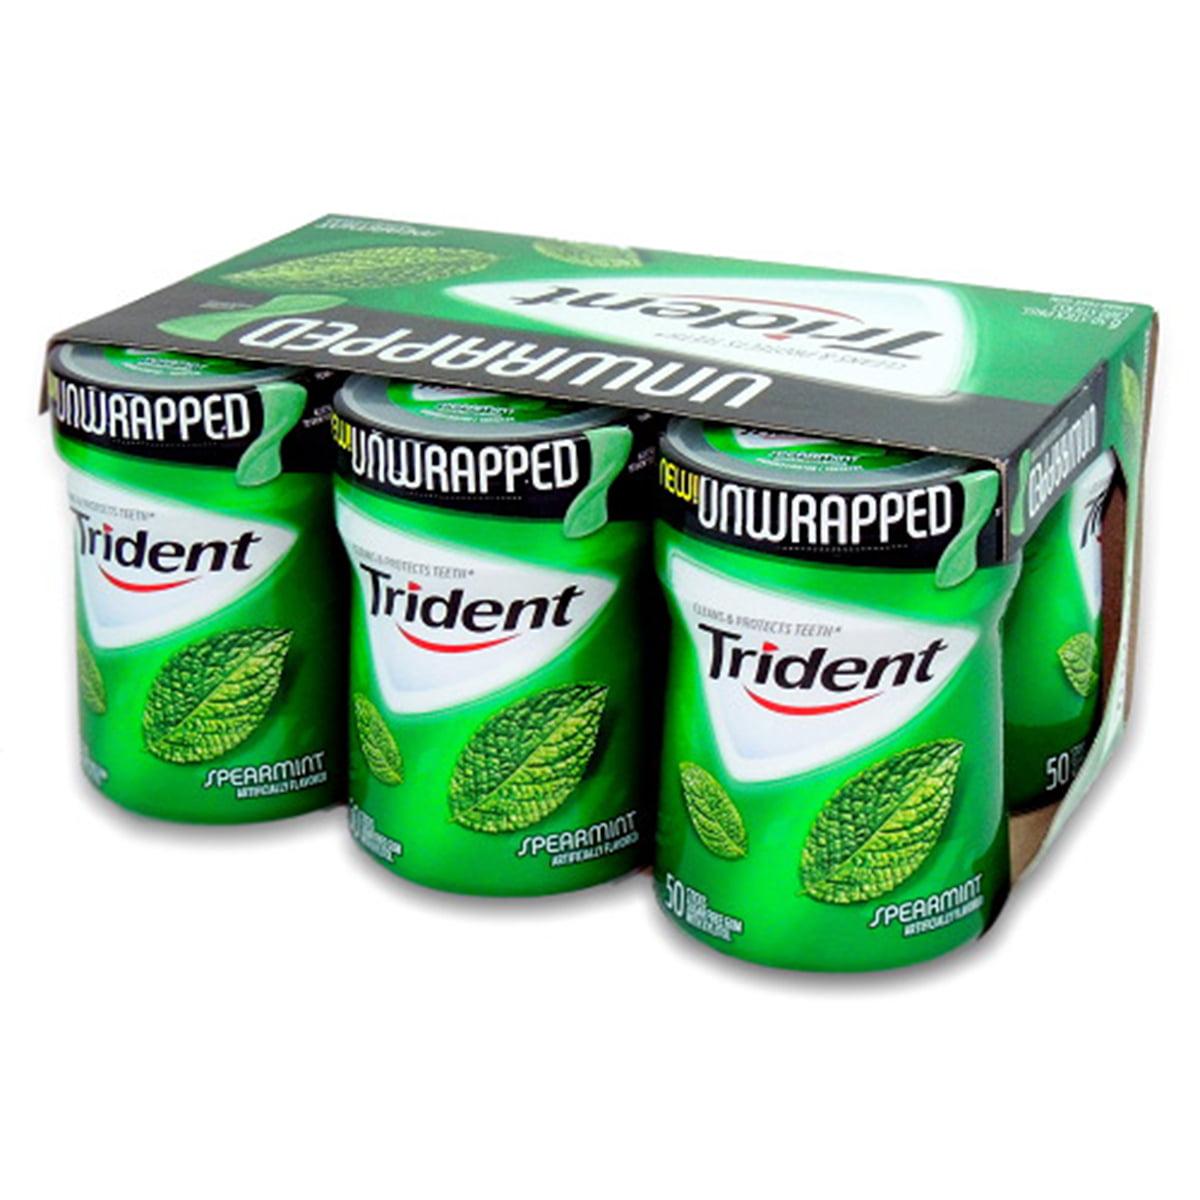 Trident Unwrapped Sugar Free Gum (Spearmint, 50-Piece, 6-Pack)